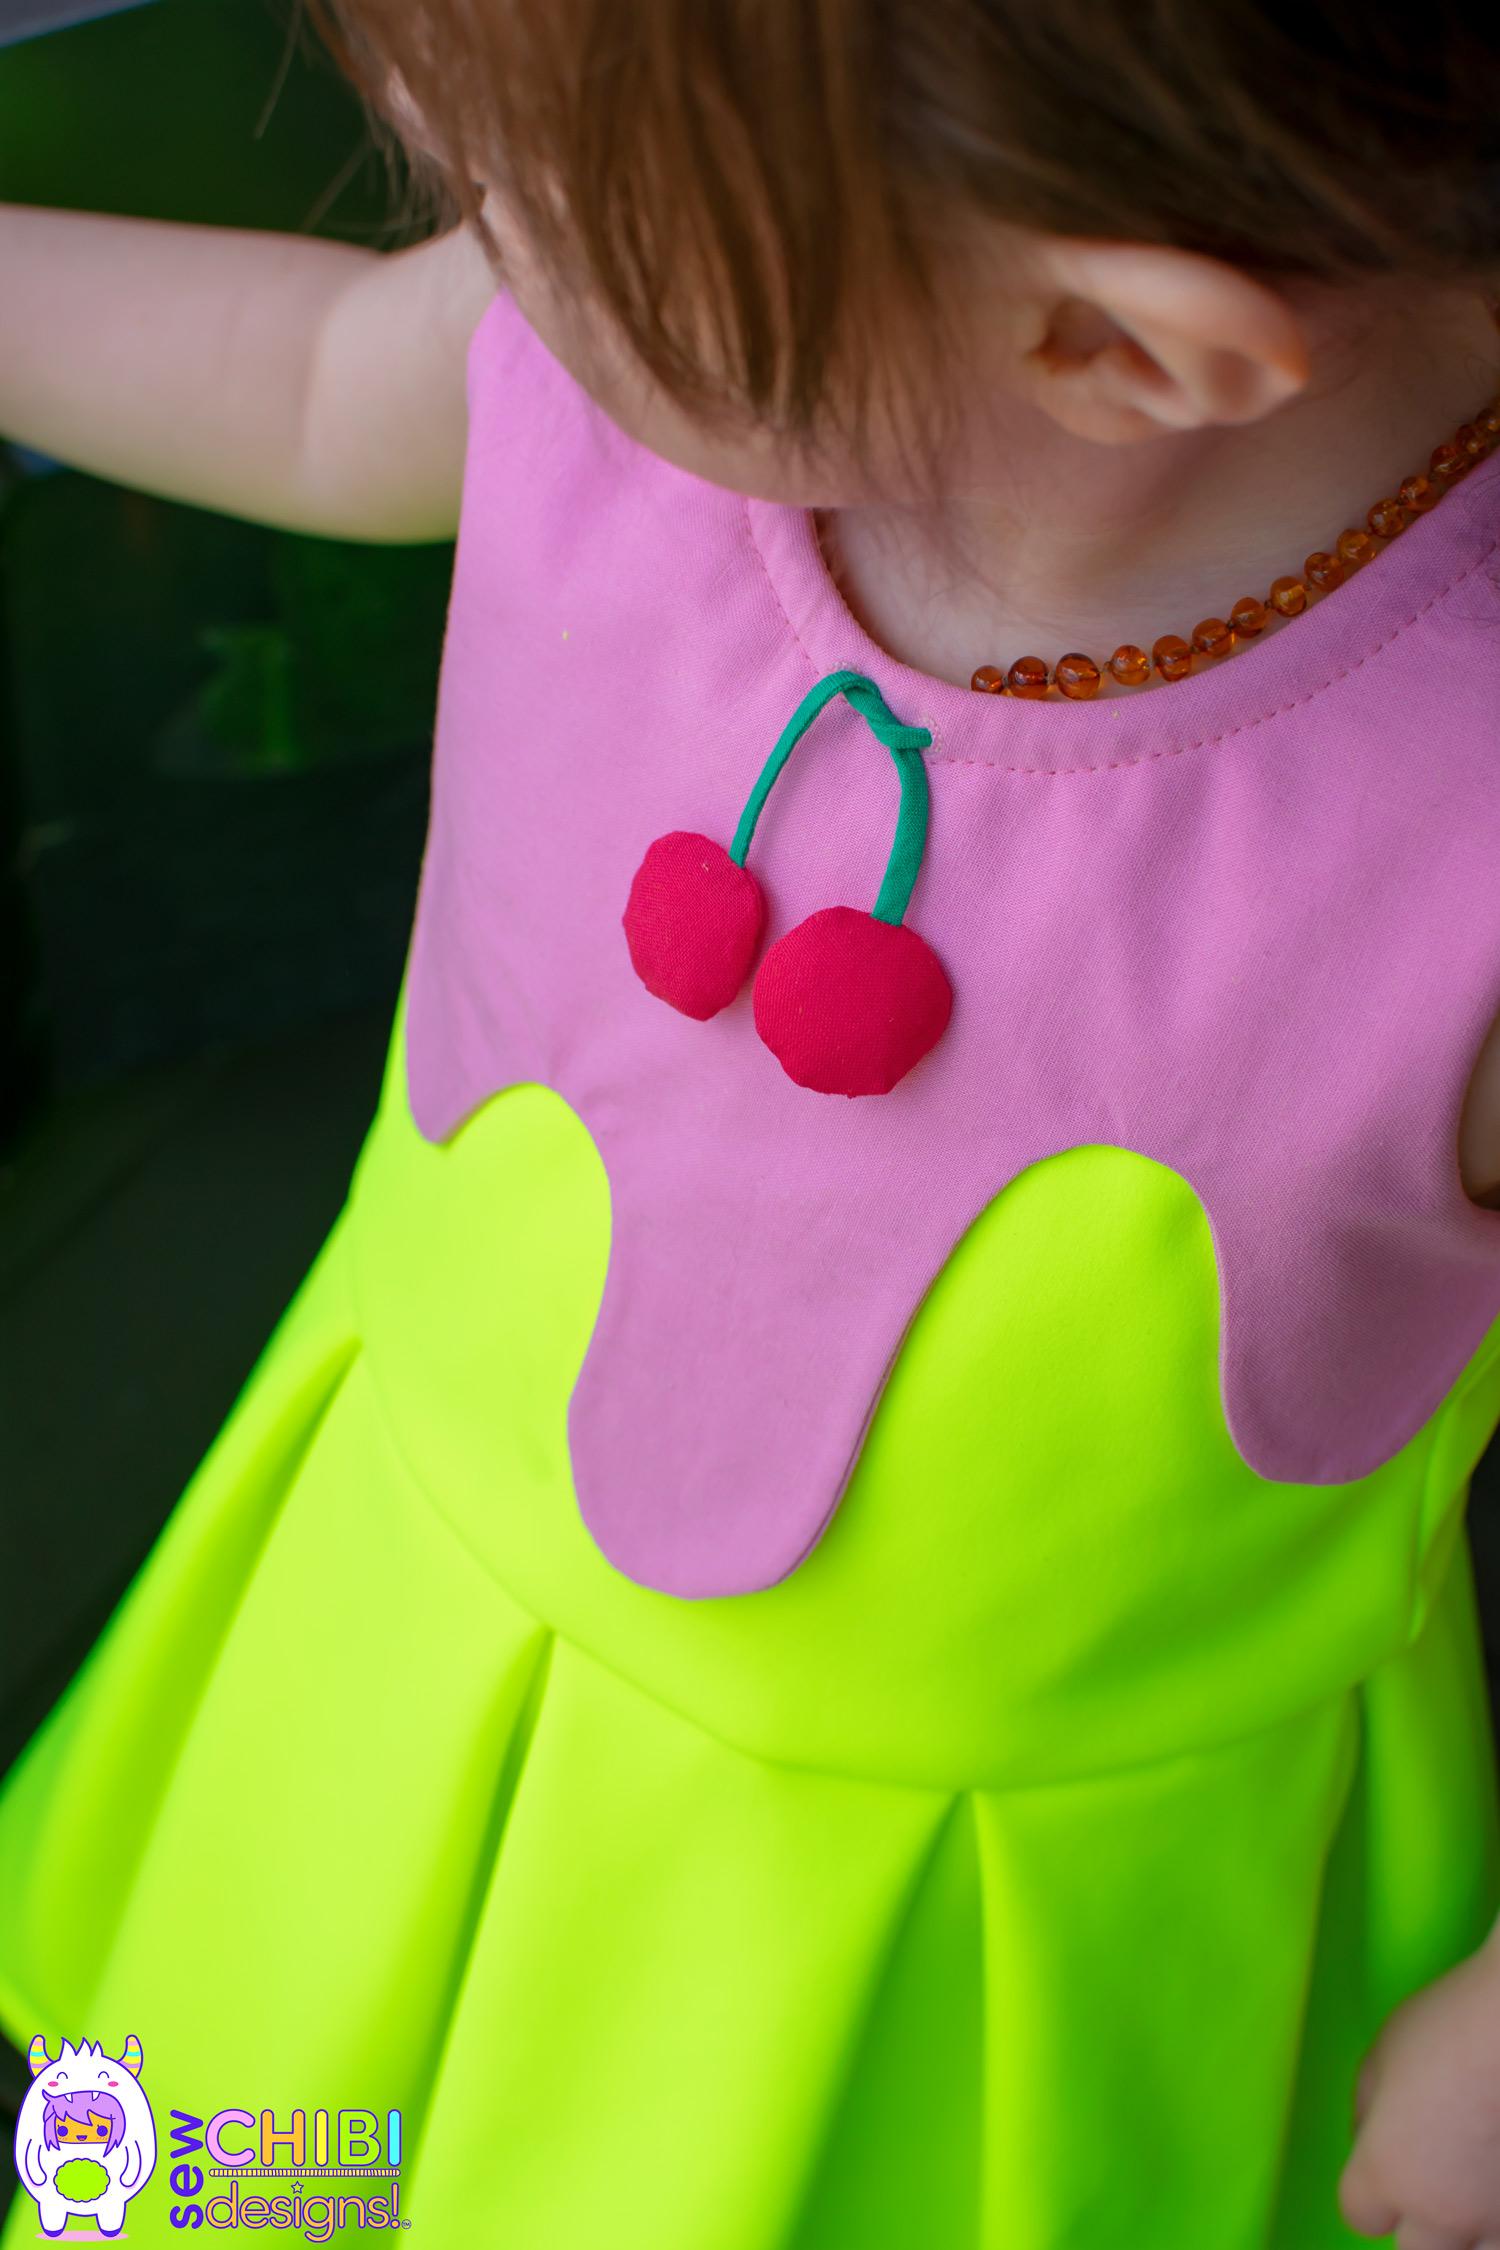 Sew-Chibi-Designs-Sew-Your-Stash-Ice-Cream-and-Sundays-4.jpg